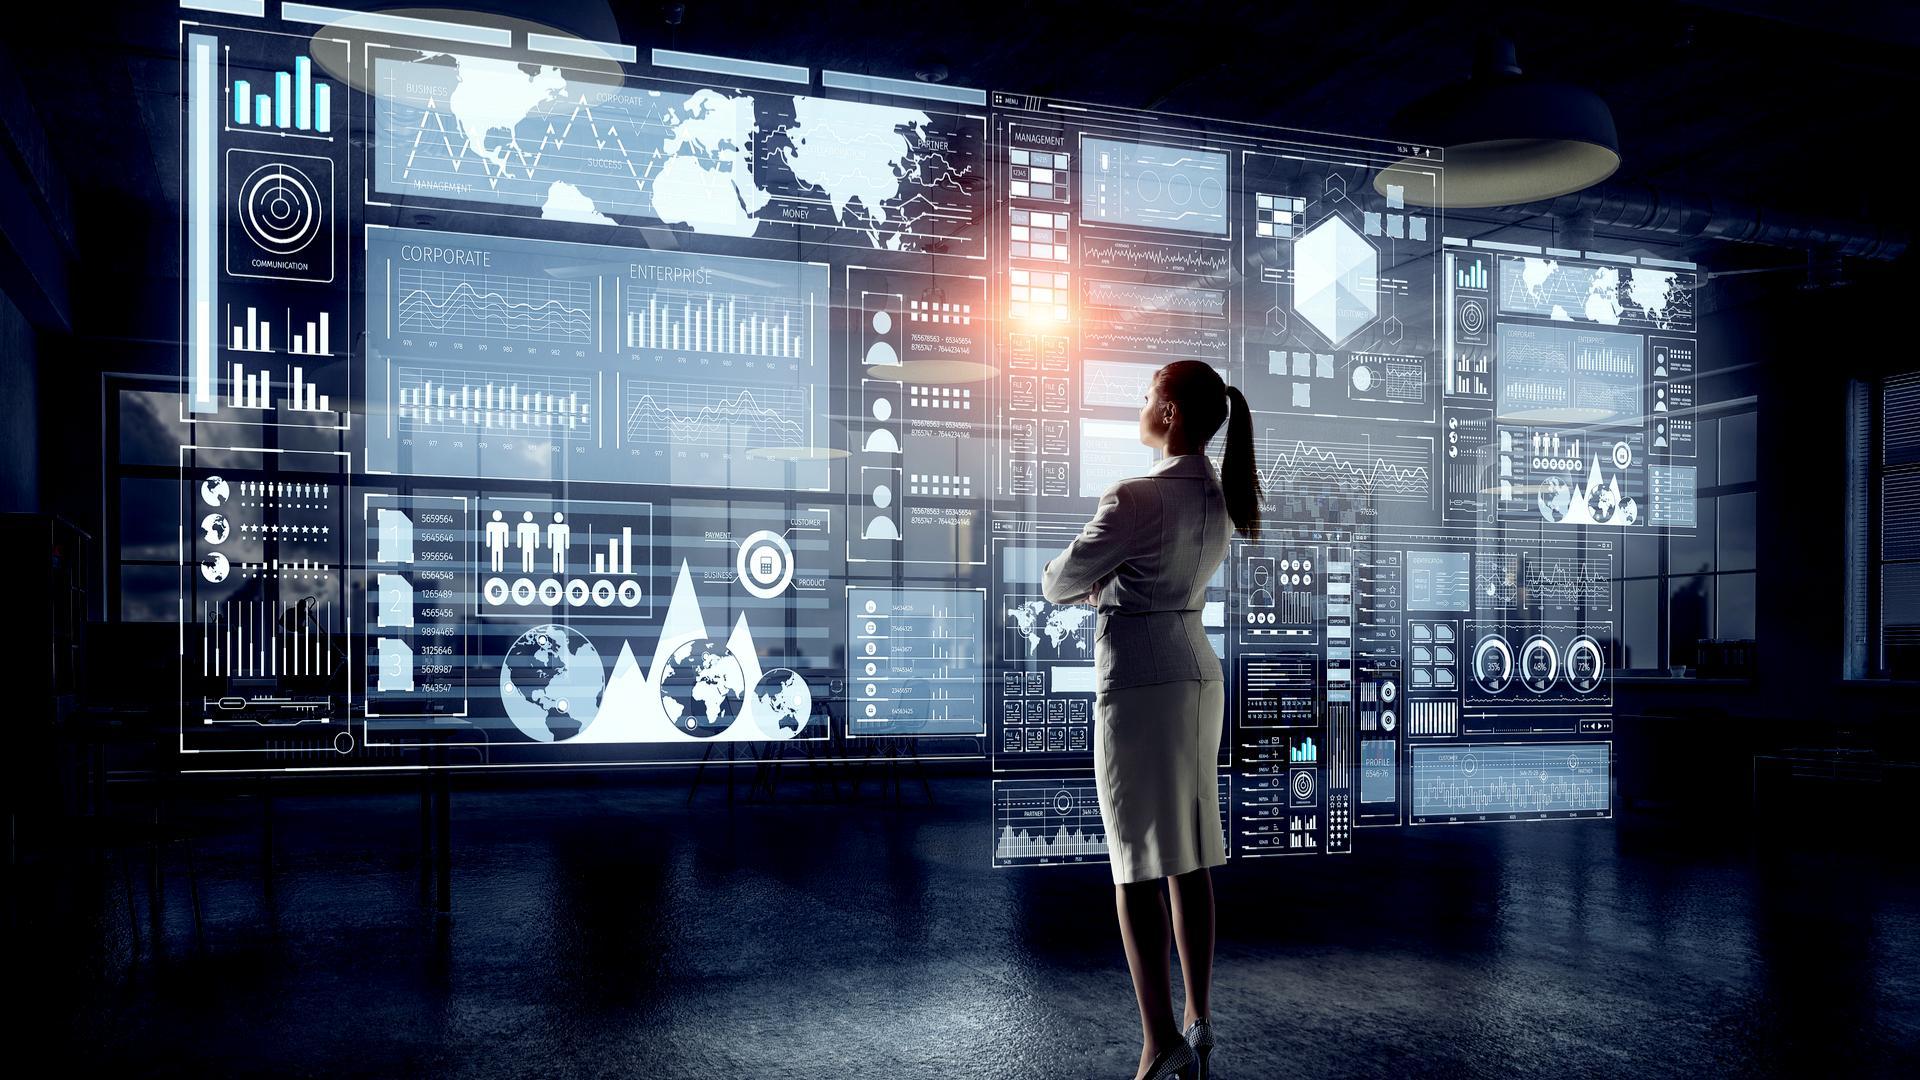 Atechup © Big Data & Analytics Entrepreneurship Certification Sheffield